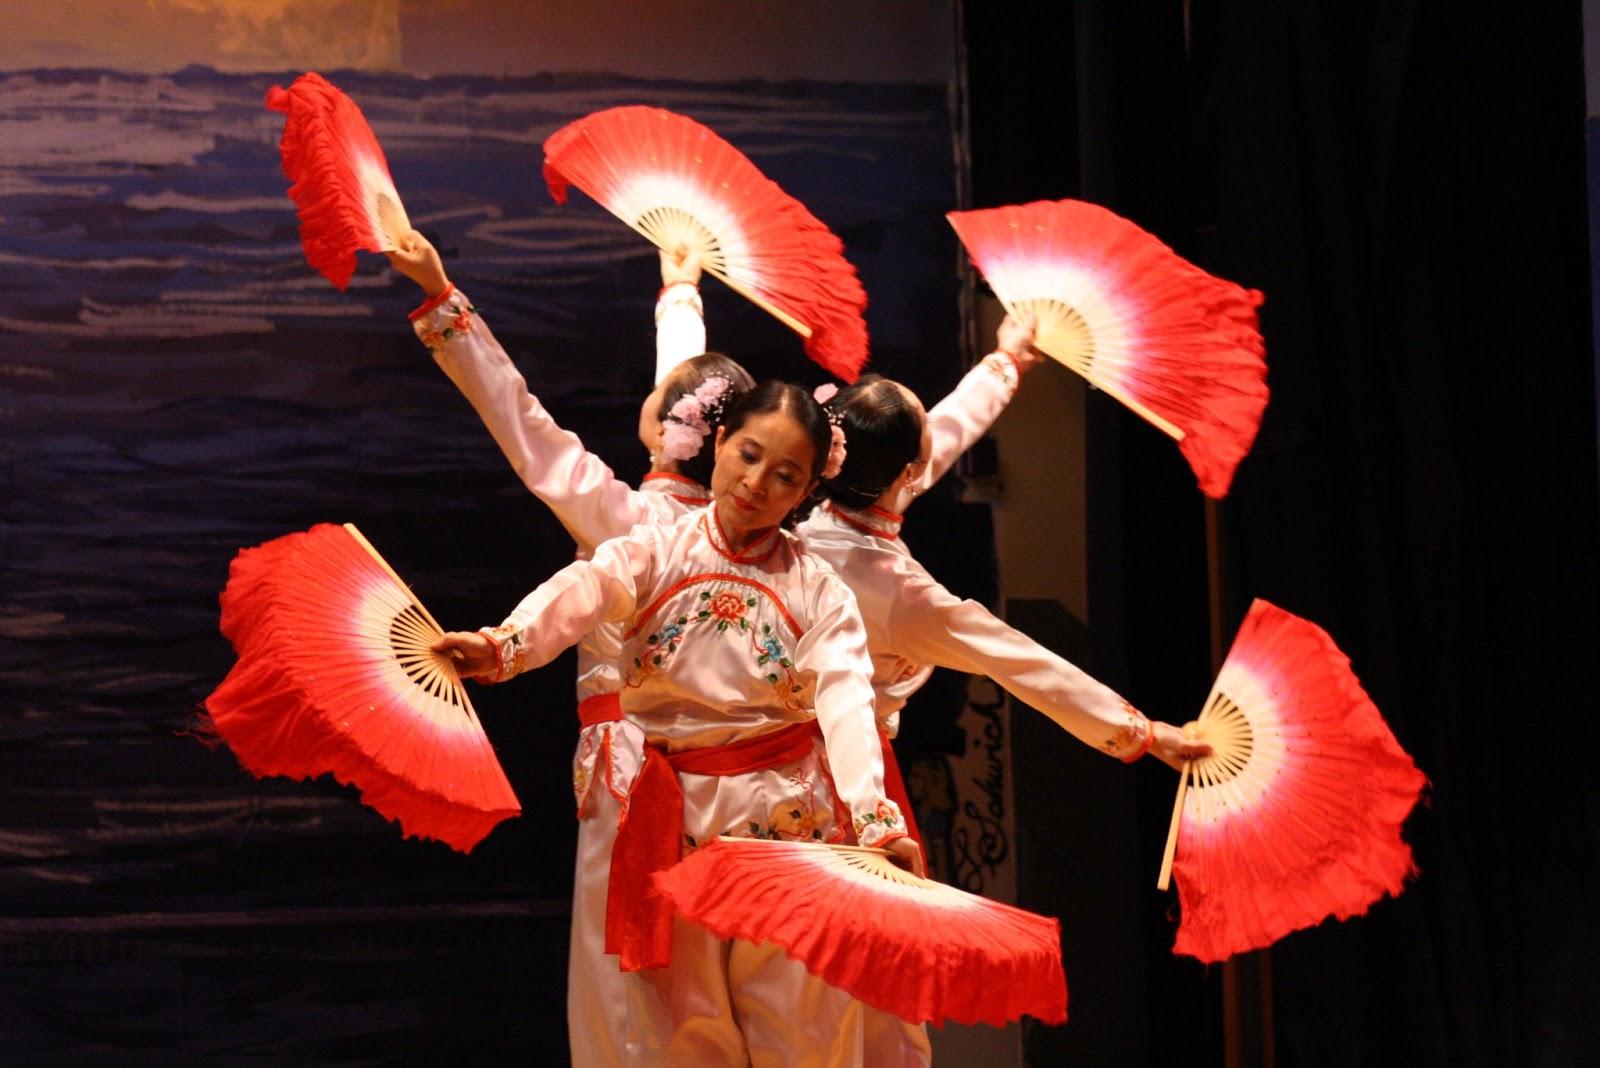 китаянки танец с веерами картинки вас